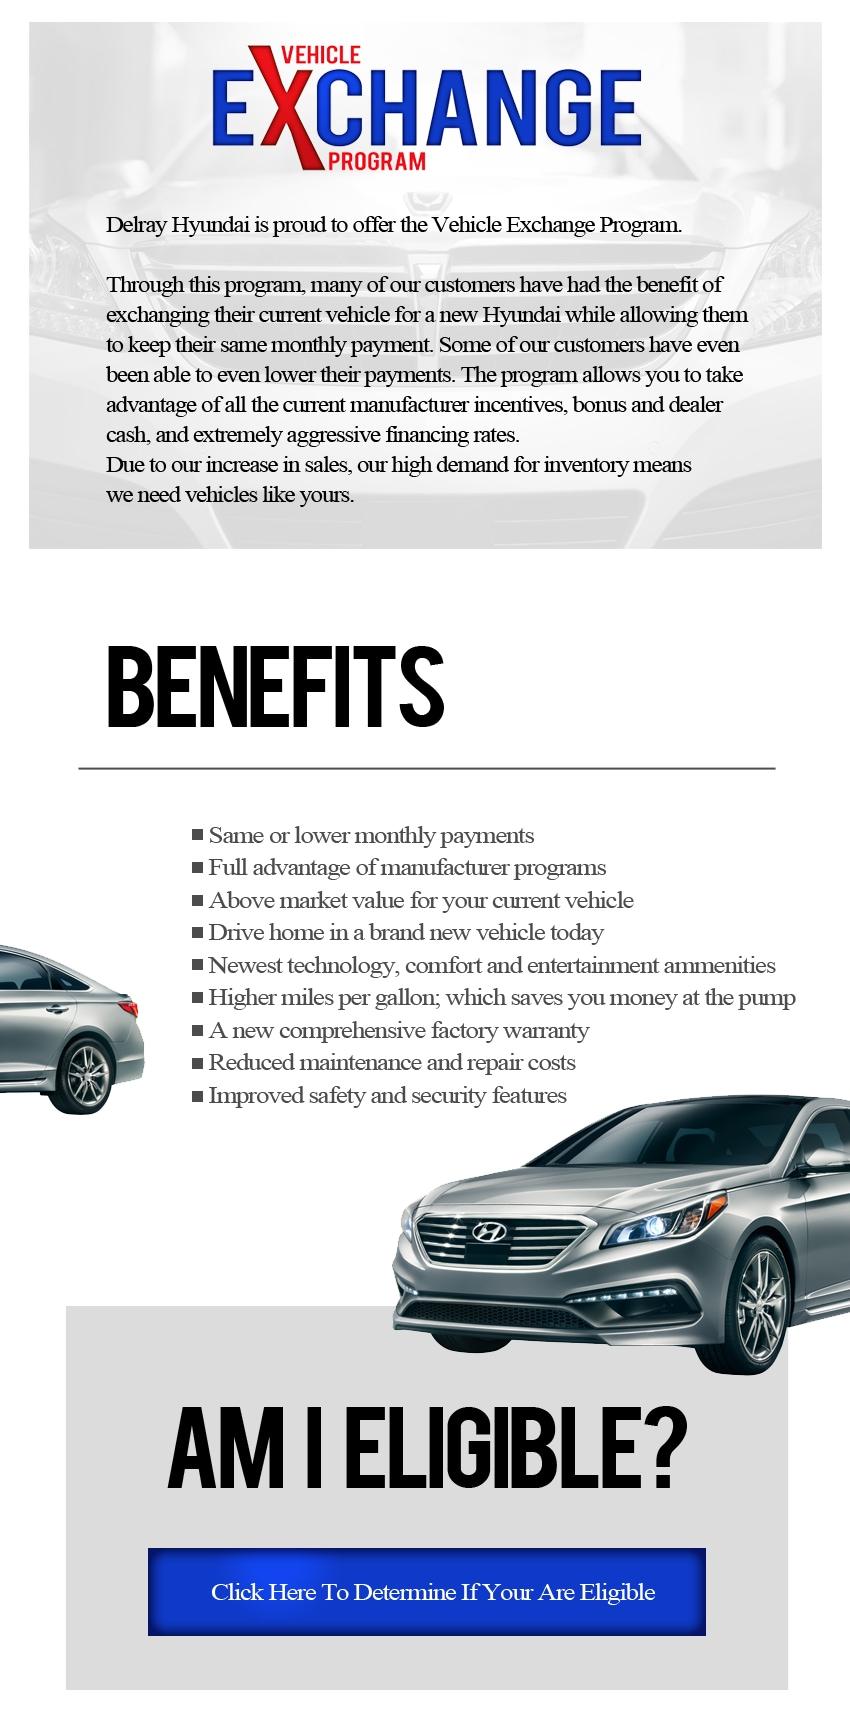 Delray Hyundai | New Hyundai dealership in Delray, FL 33483